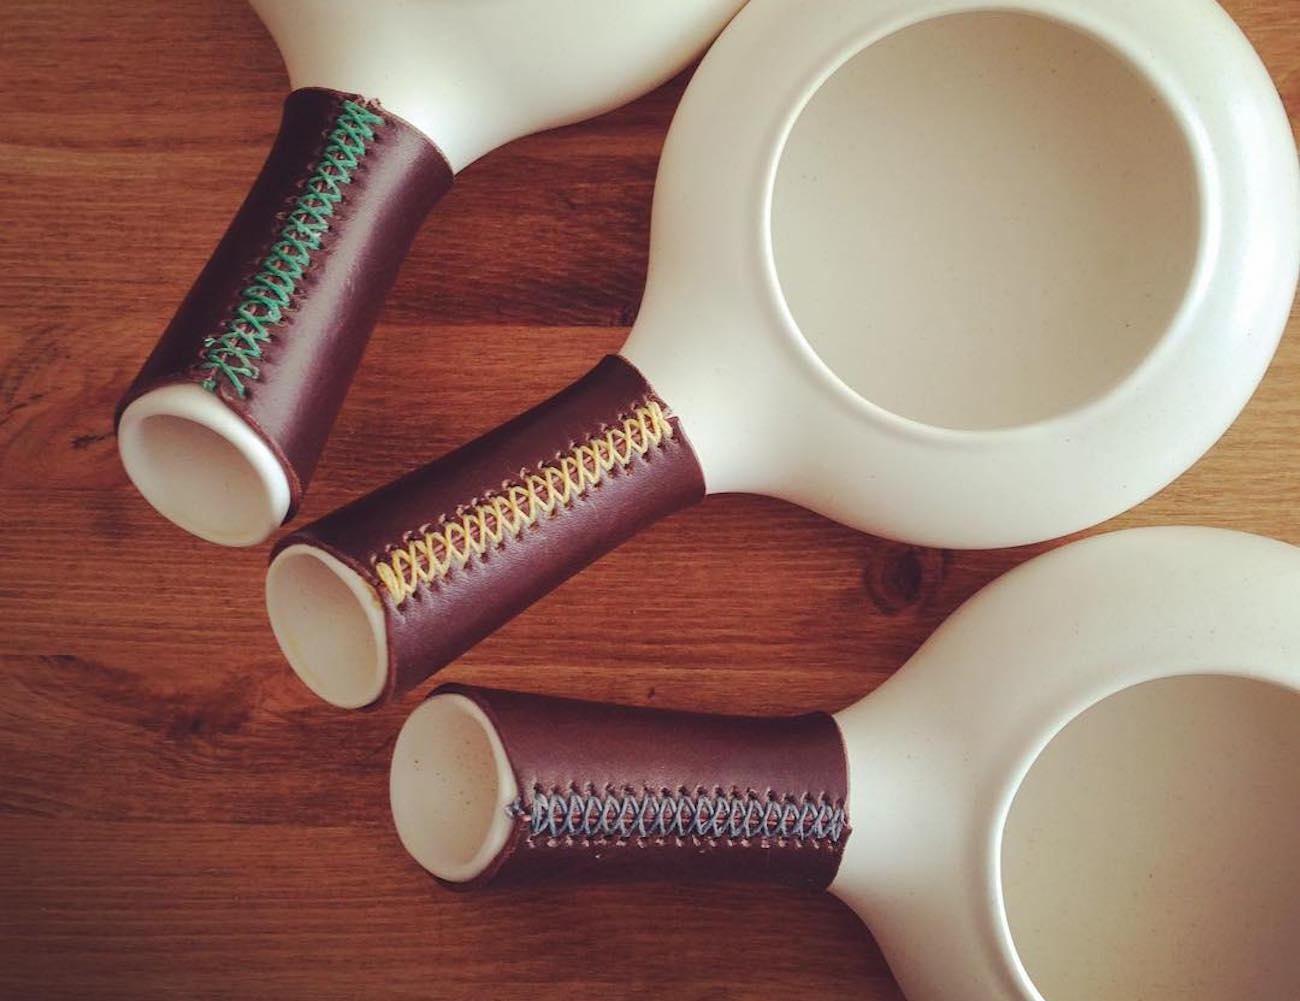 Horoku – The Ceramic Coffee Roaster by zenroast